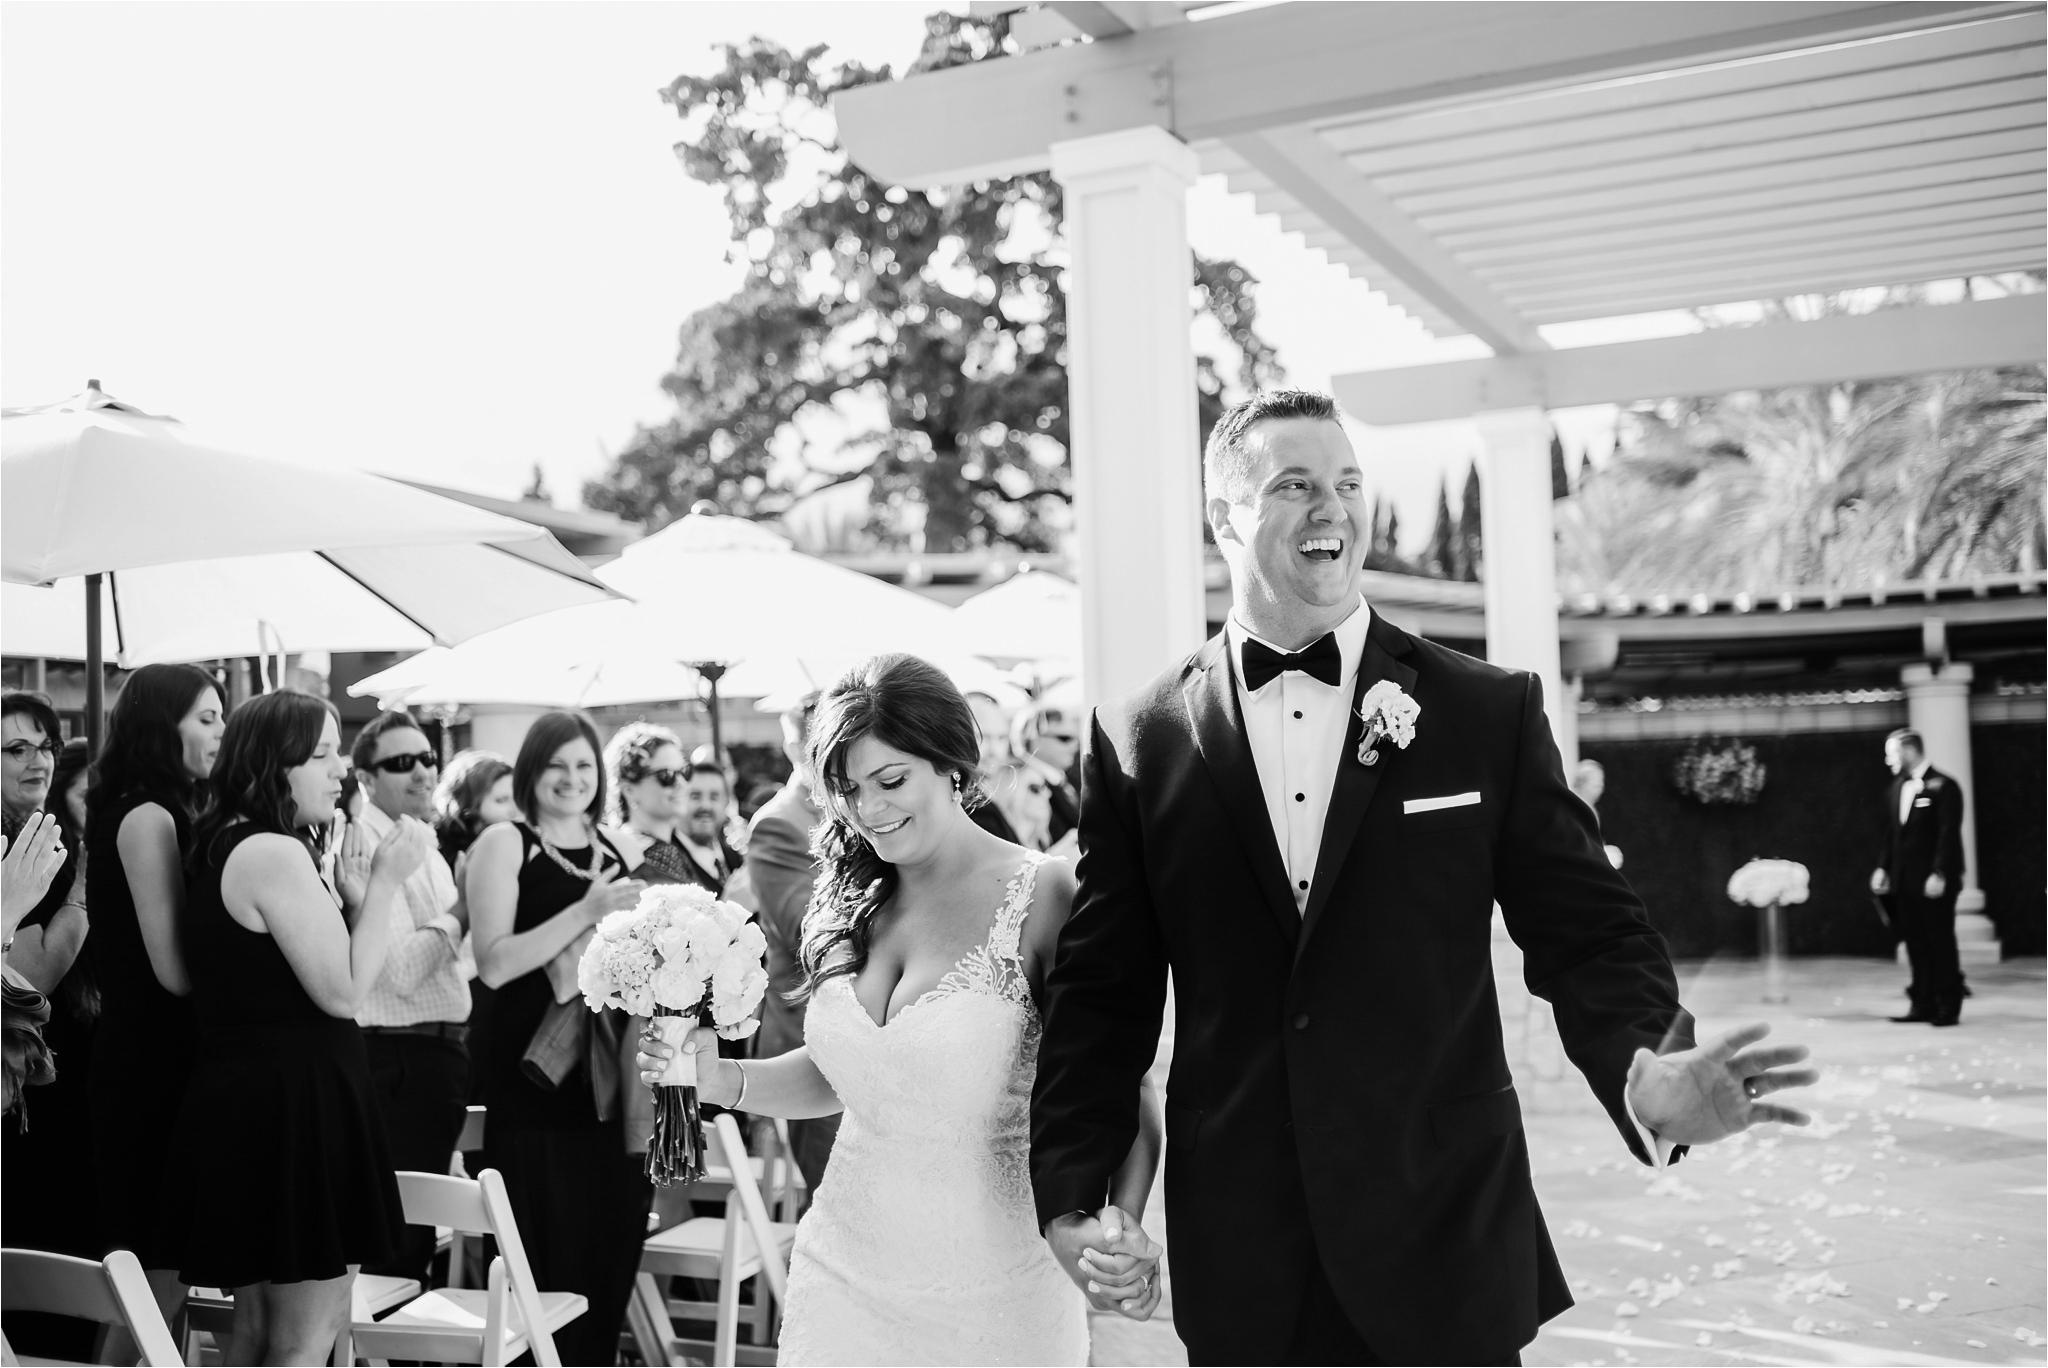 jessica-roman-photography-arden hills wedding photograpger-sacramento-boise-28.jpg